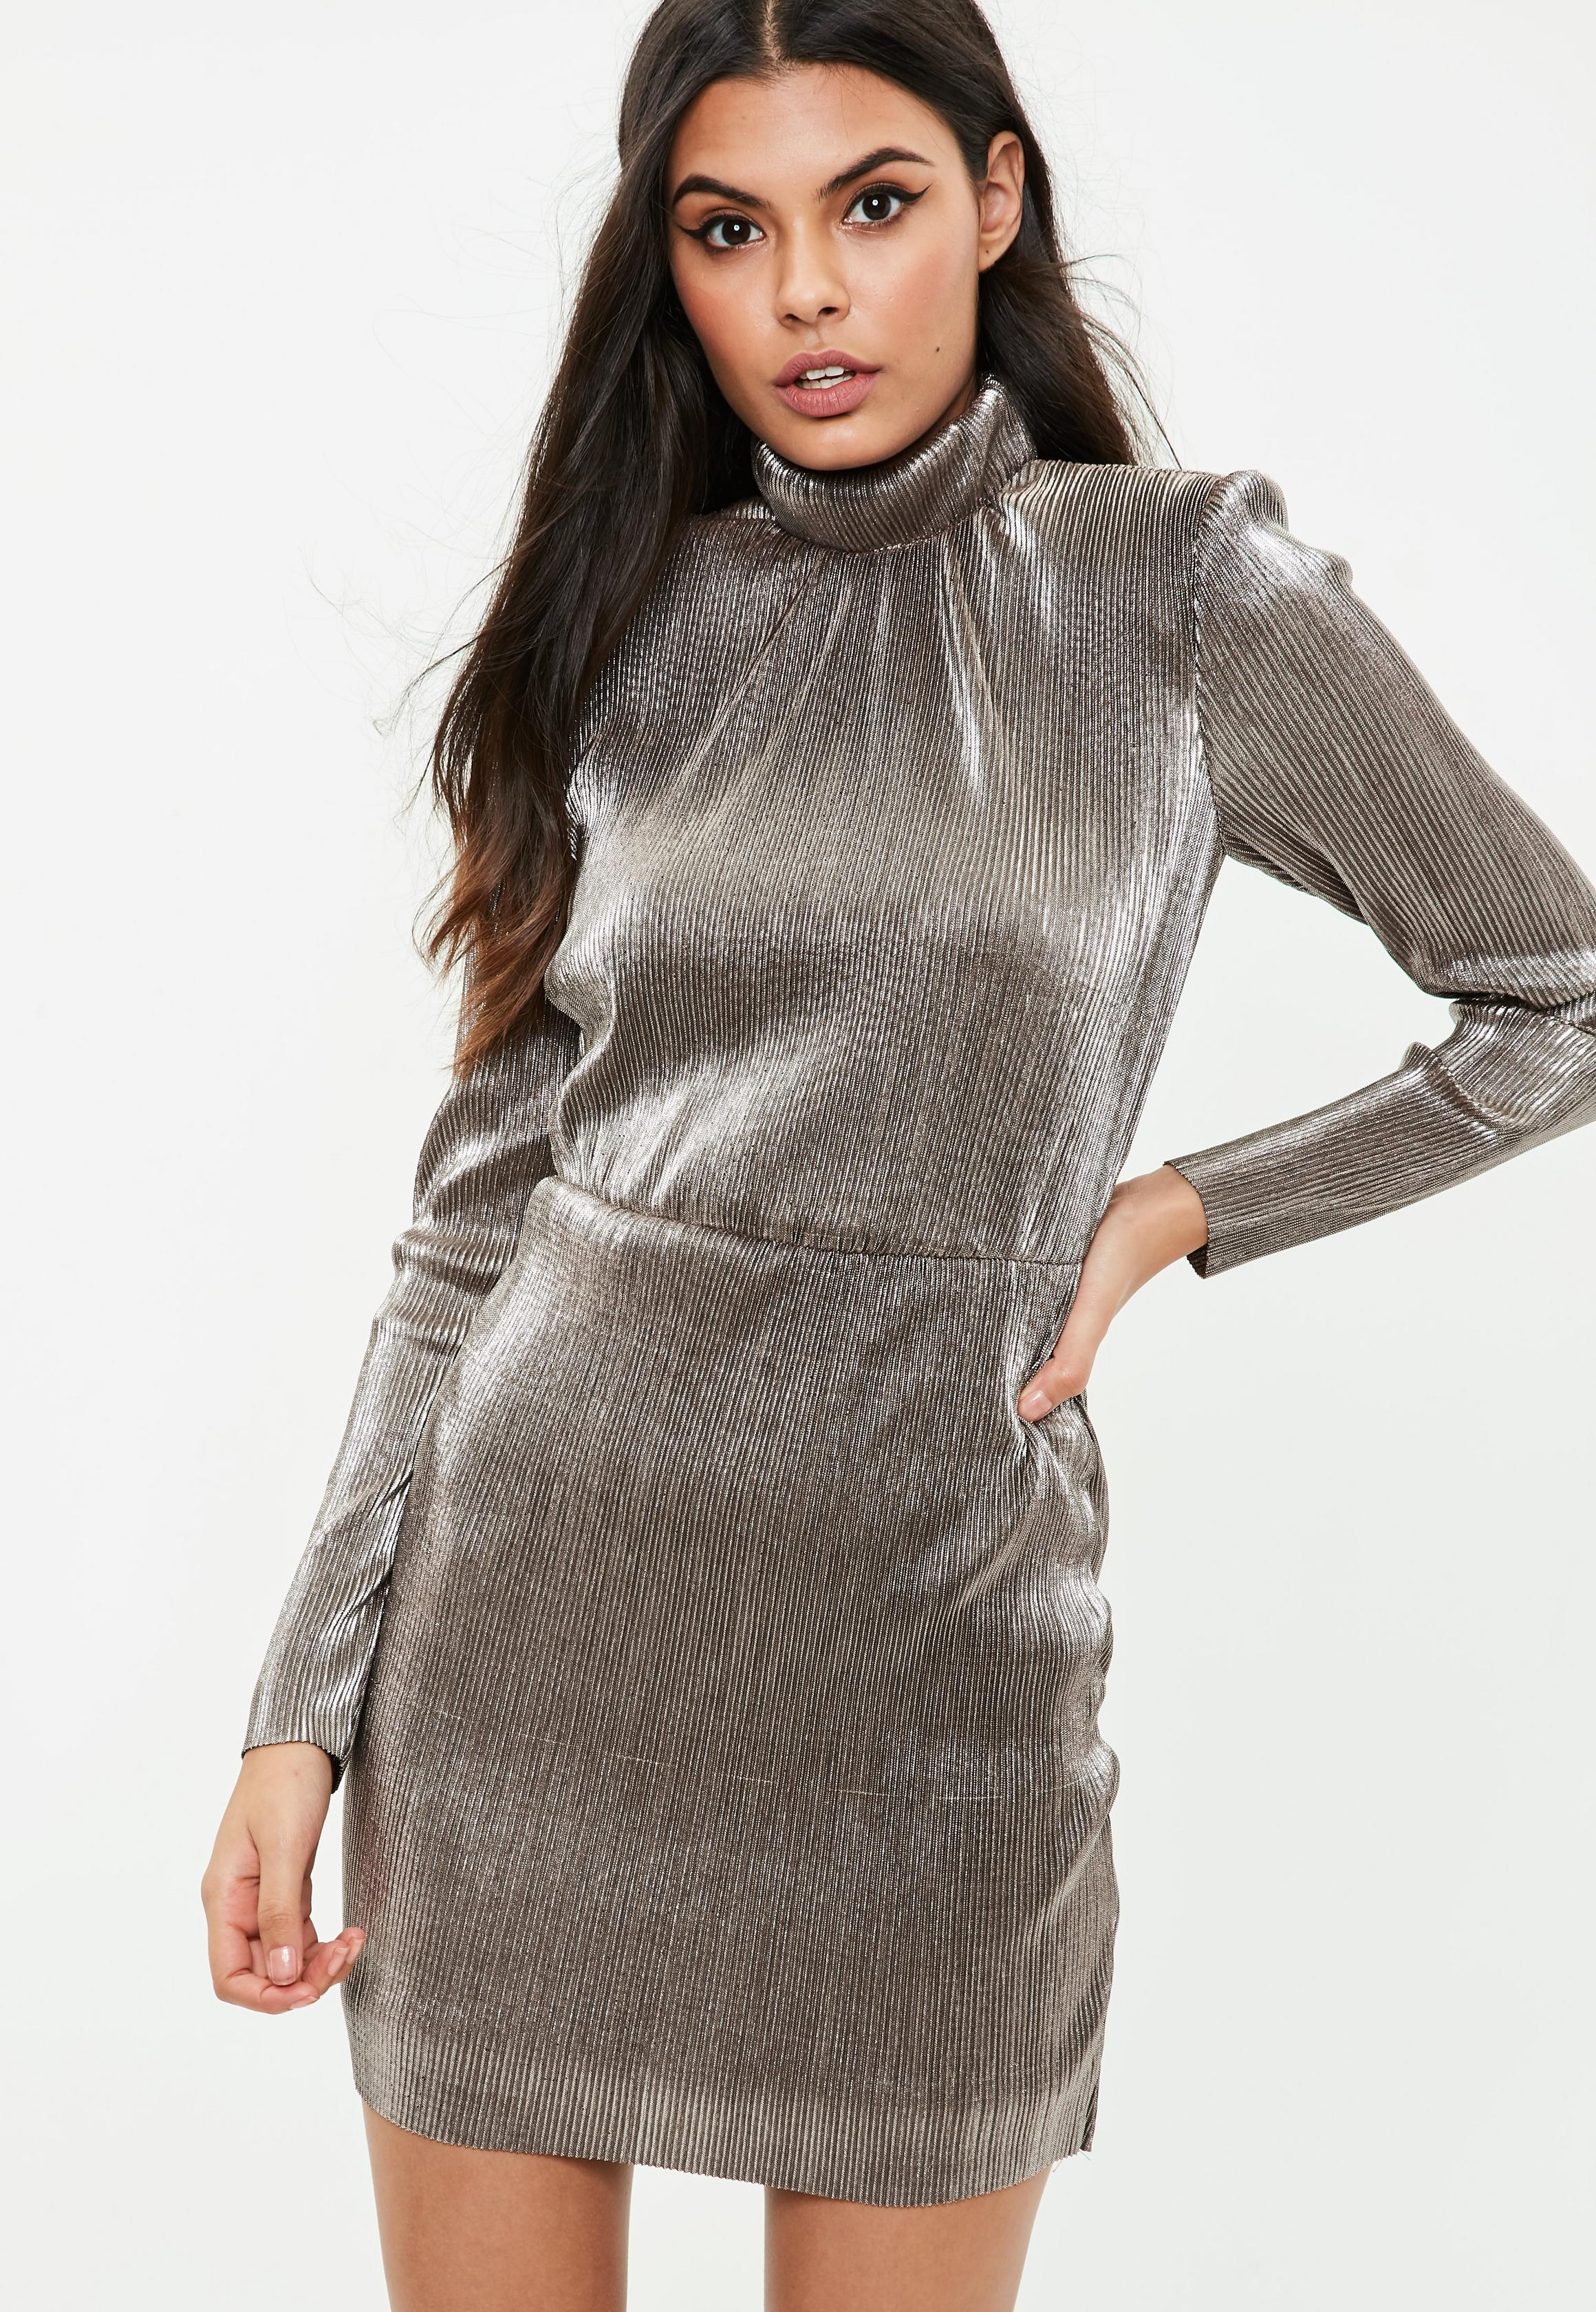 metallic-high-neck-pleated-dress.jpg